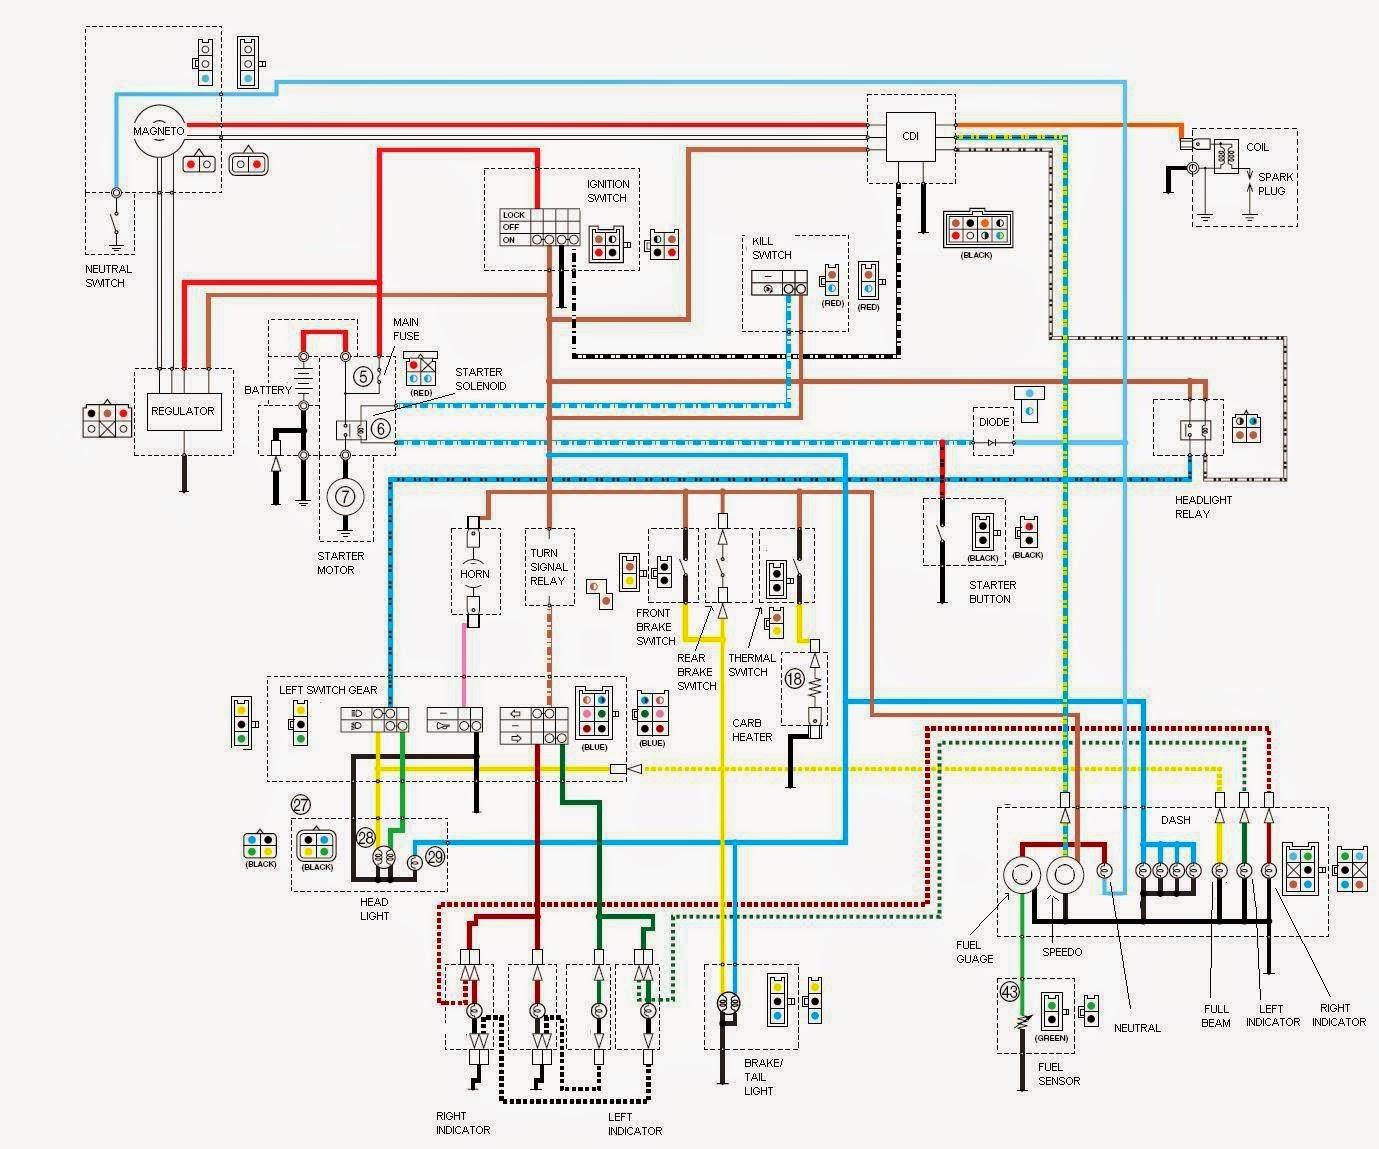 honda rancher ignition wiring diagram ktm 2 stroke ignition wiring diagram wiring diagram h5  ktm 2 stroke ignition wiring diagram